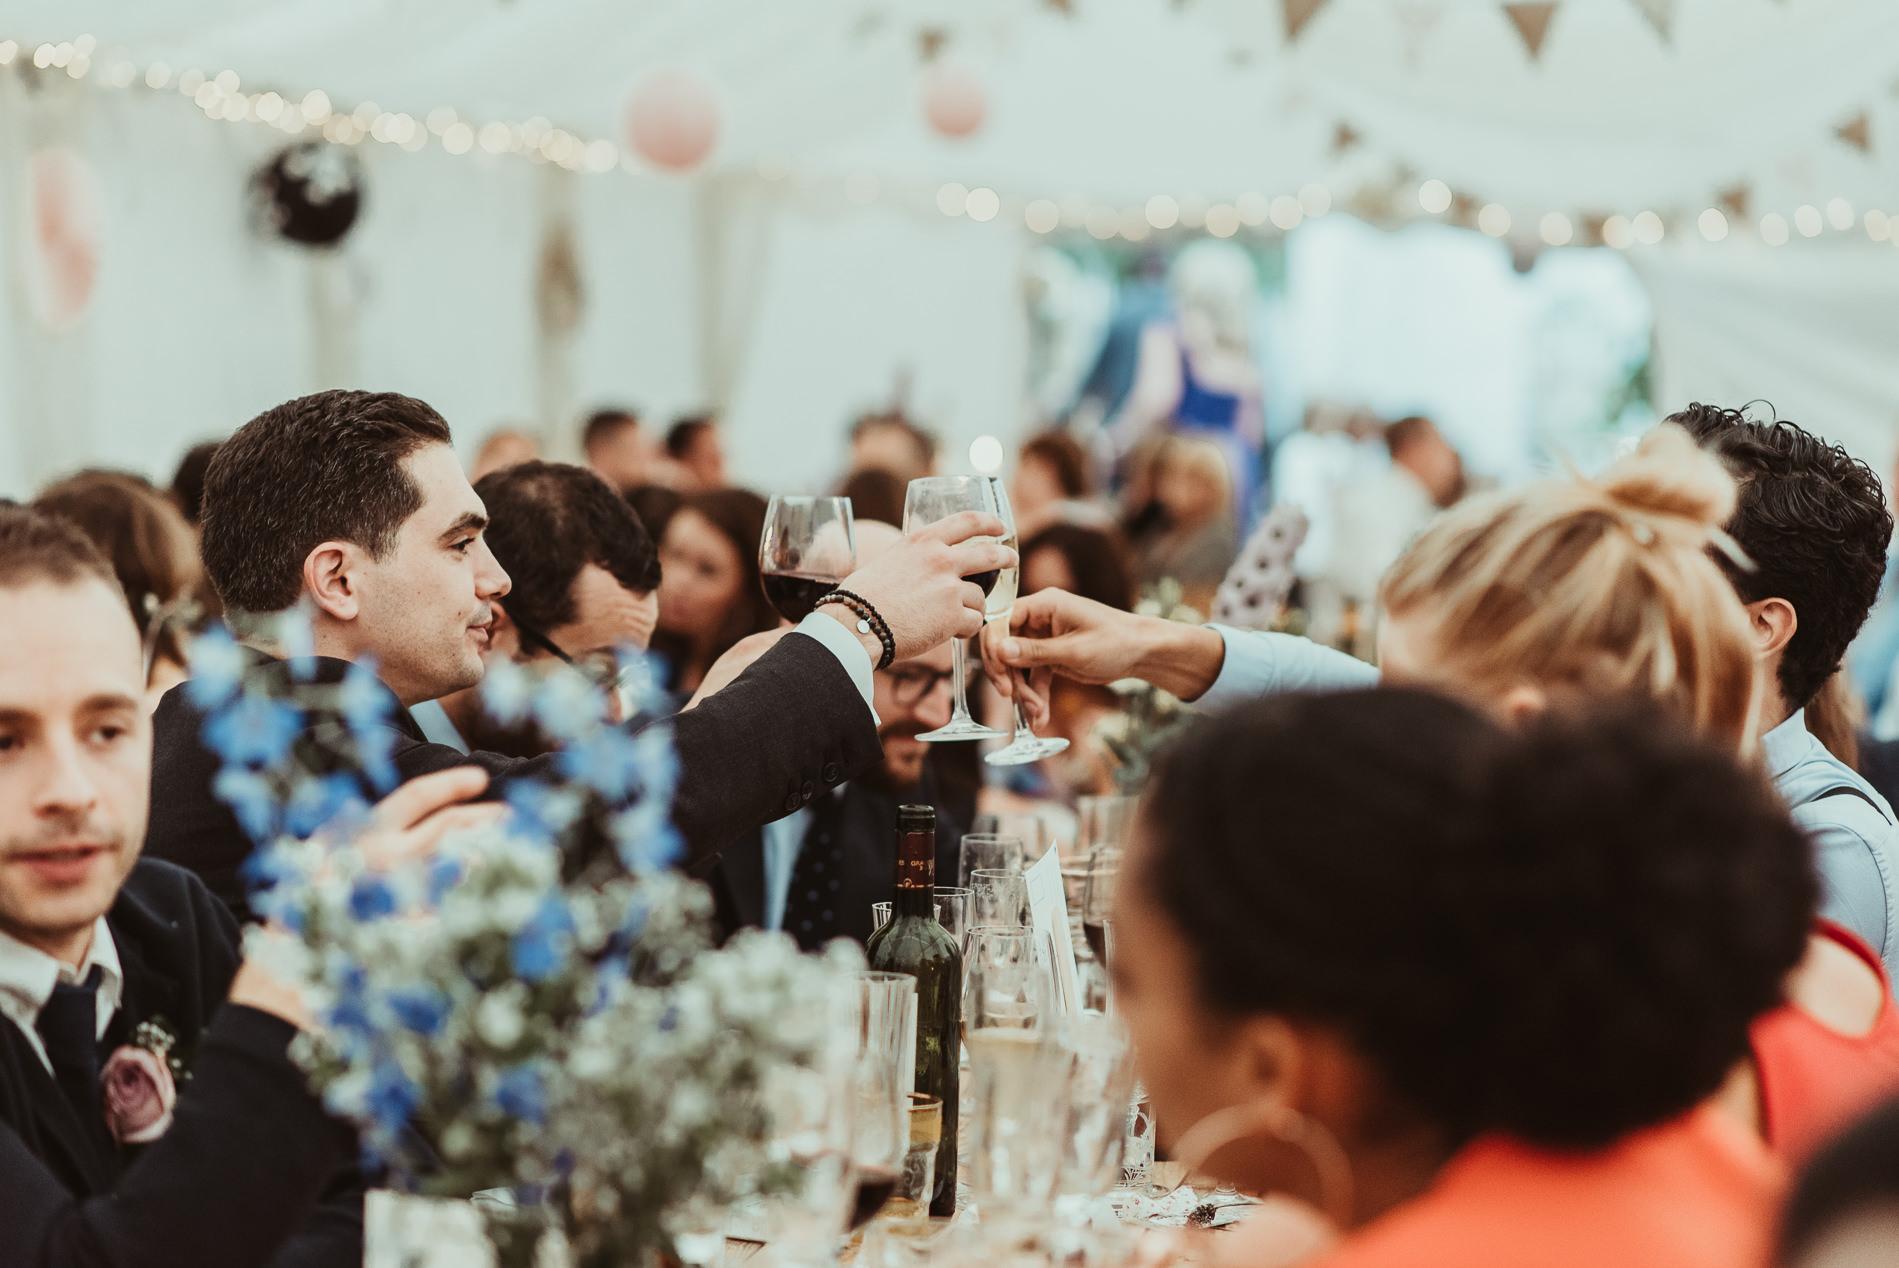 bohemian_wedding_lawshall_church_garden72